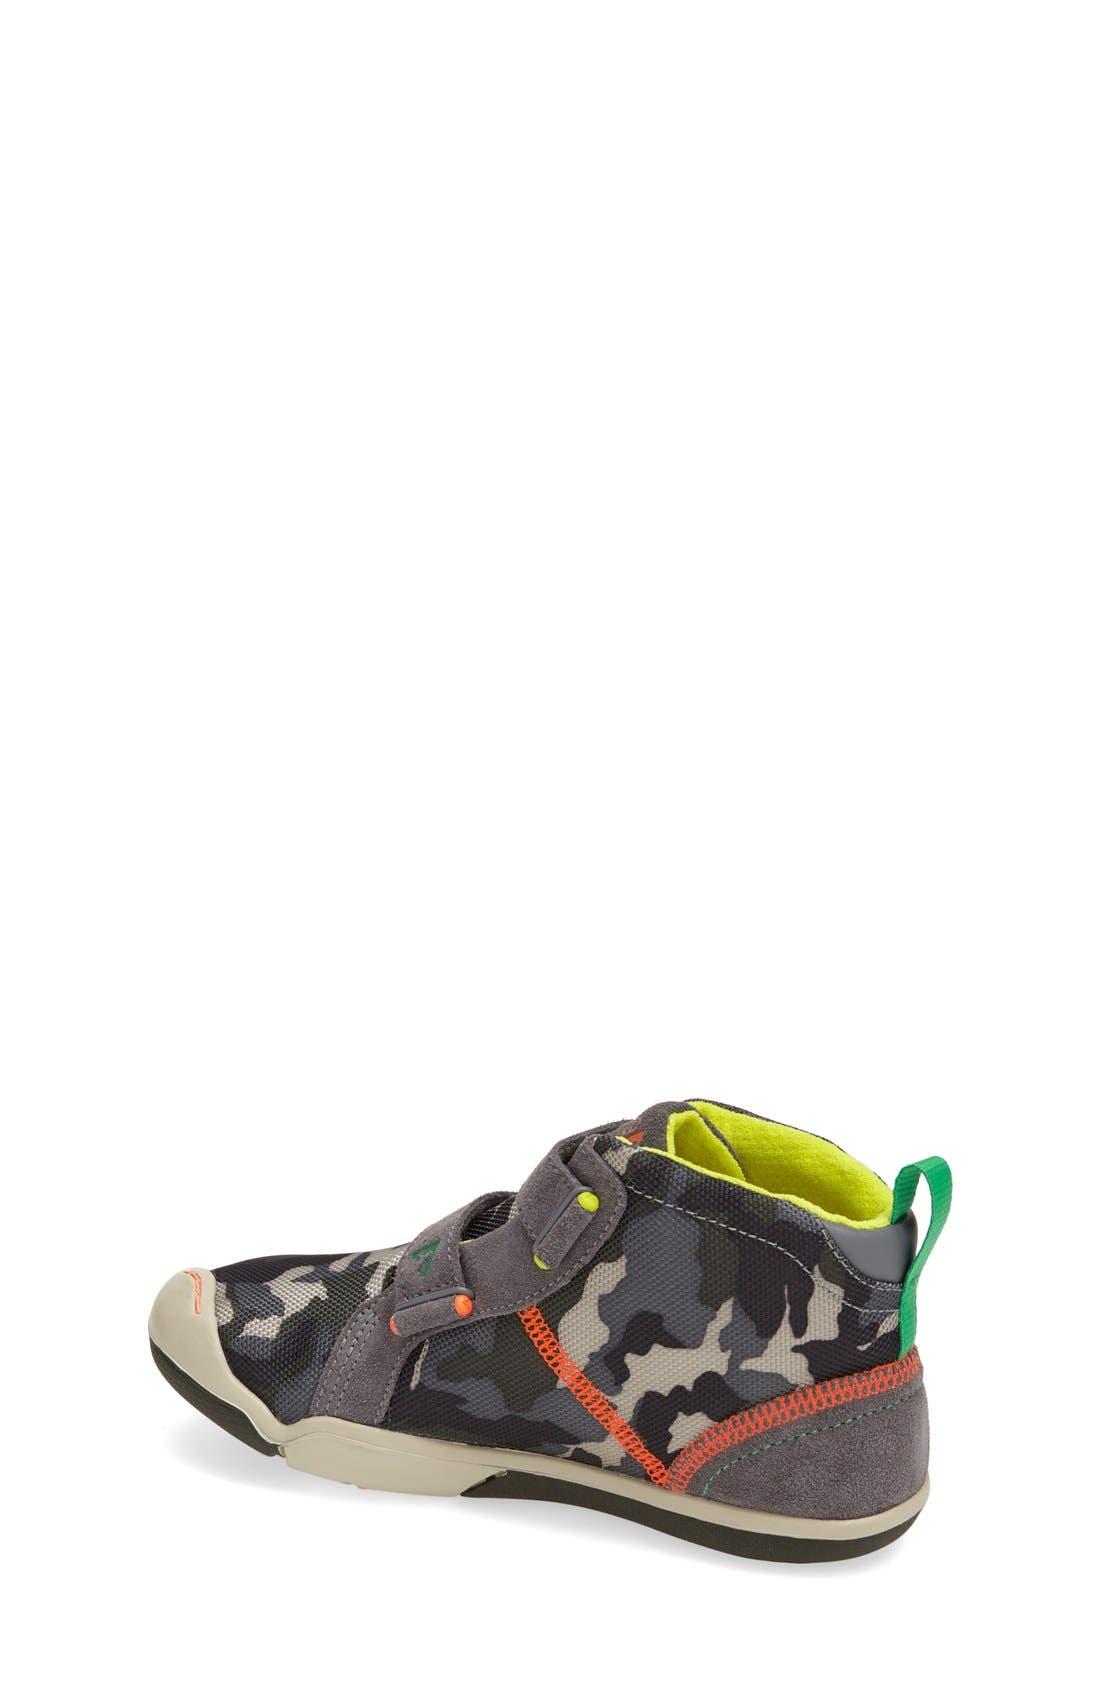 'Max' Customizable High Top Sneaker,                             Alternate thumbnail 2, color,                             054